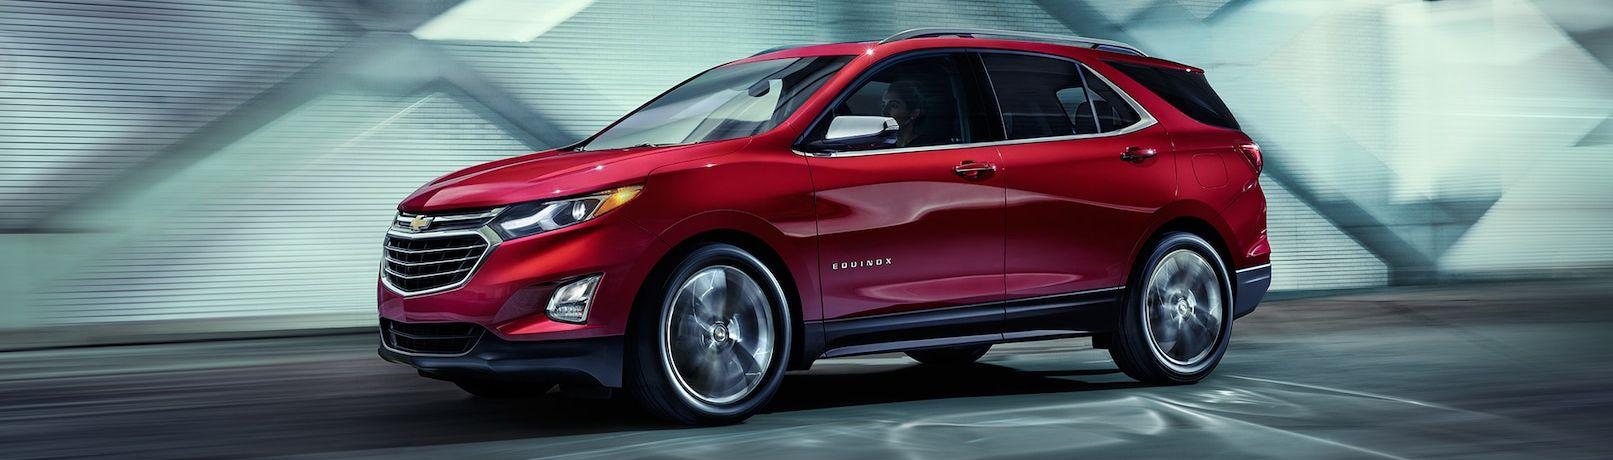 2019 Chevrolet Equinox for Sale near Ann Arbor, MI